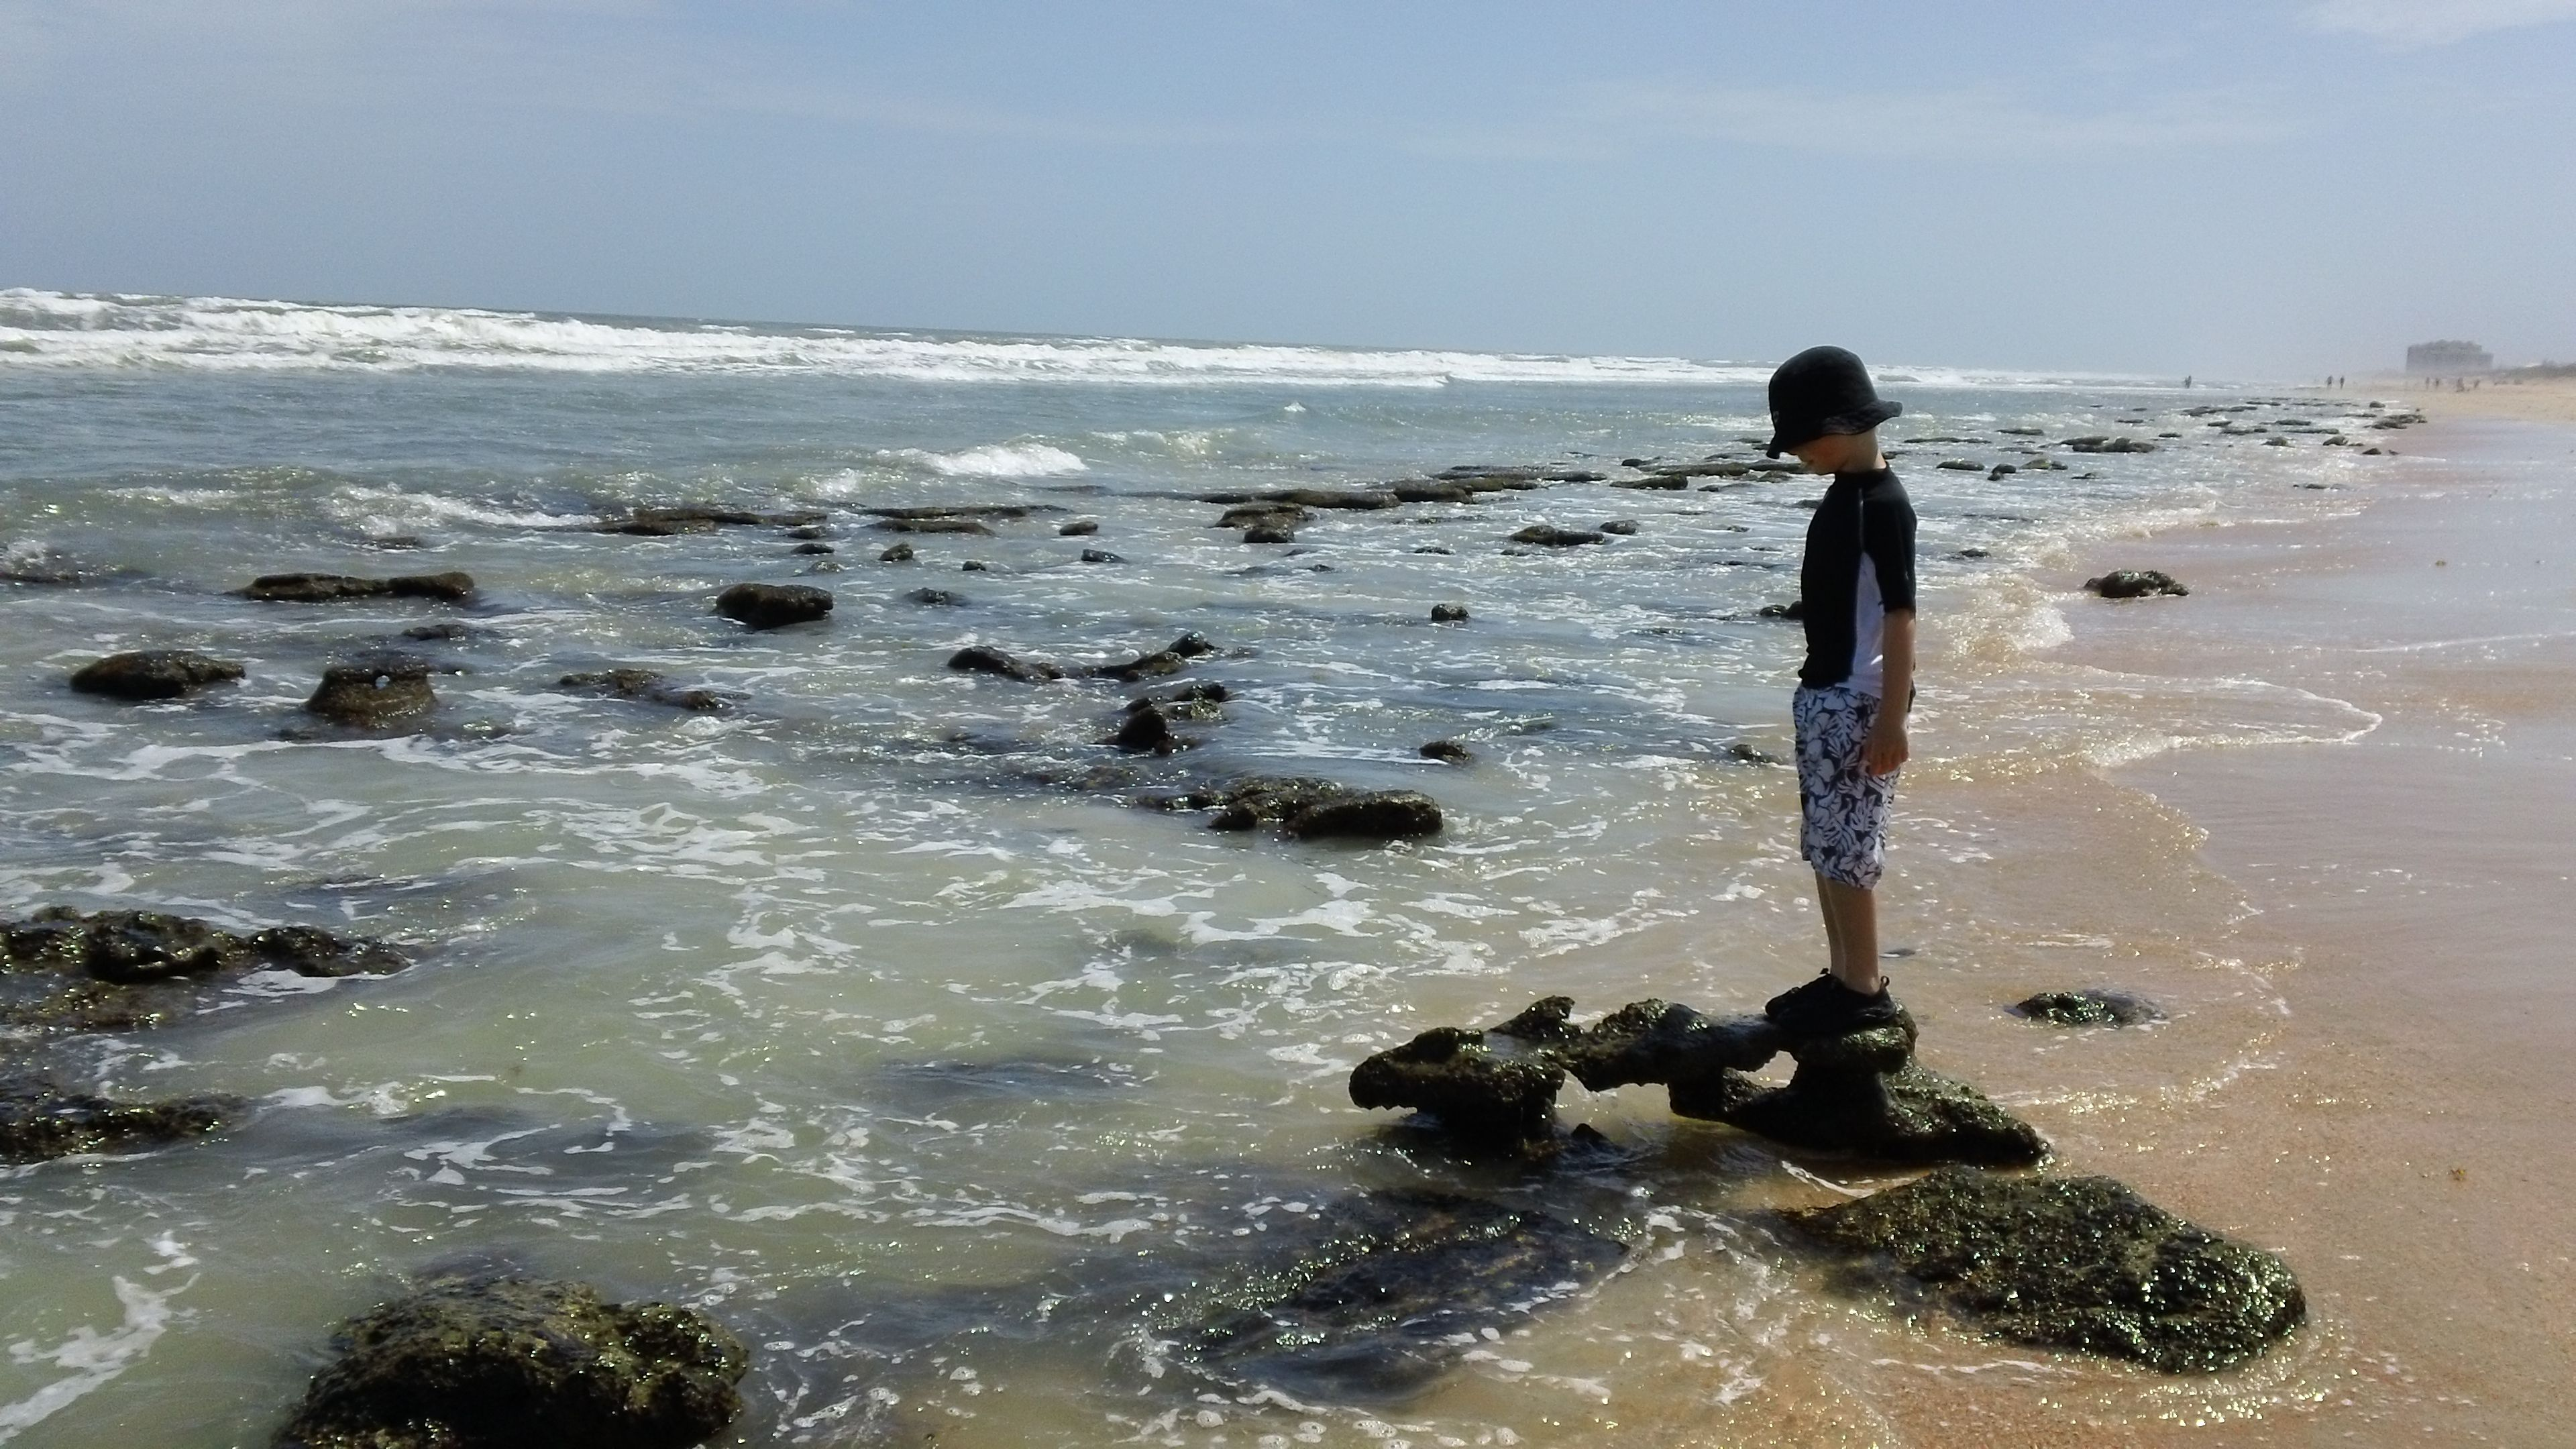 Cinnamon Beach, Fl at low tide